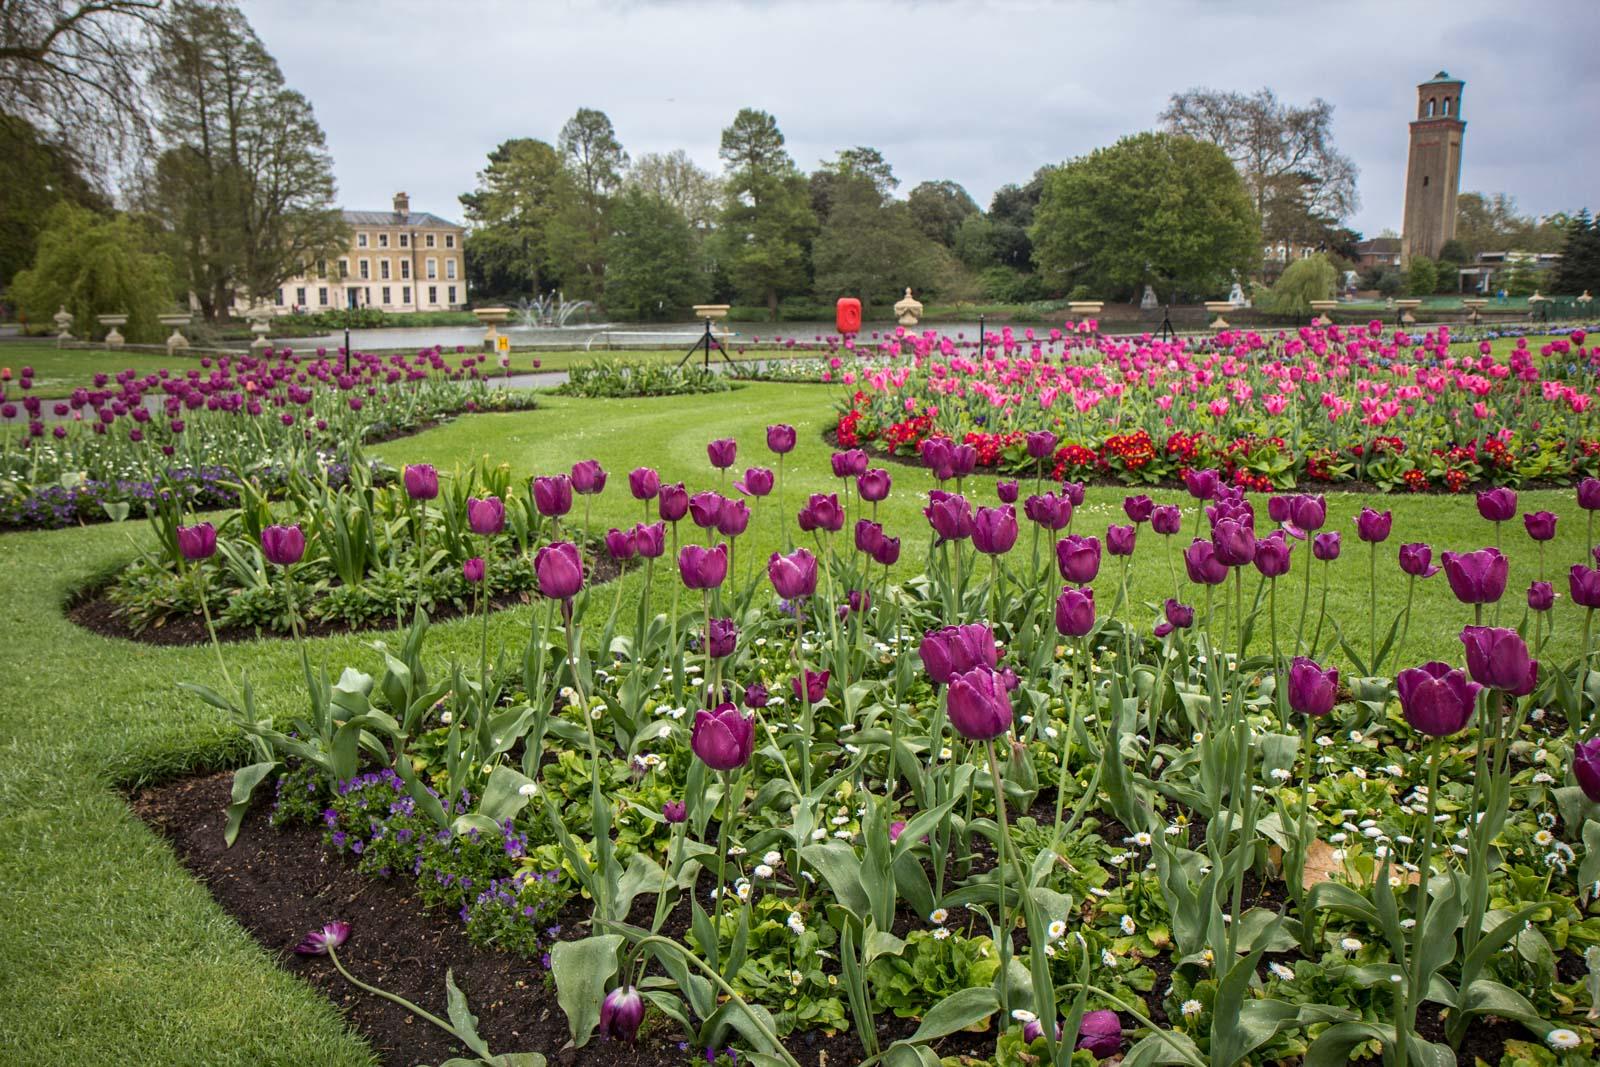 Visiting Kew Gardens, London, England